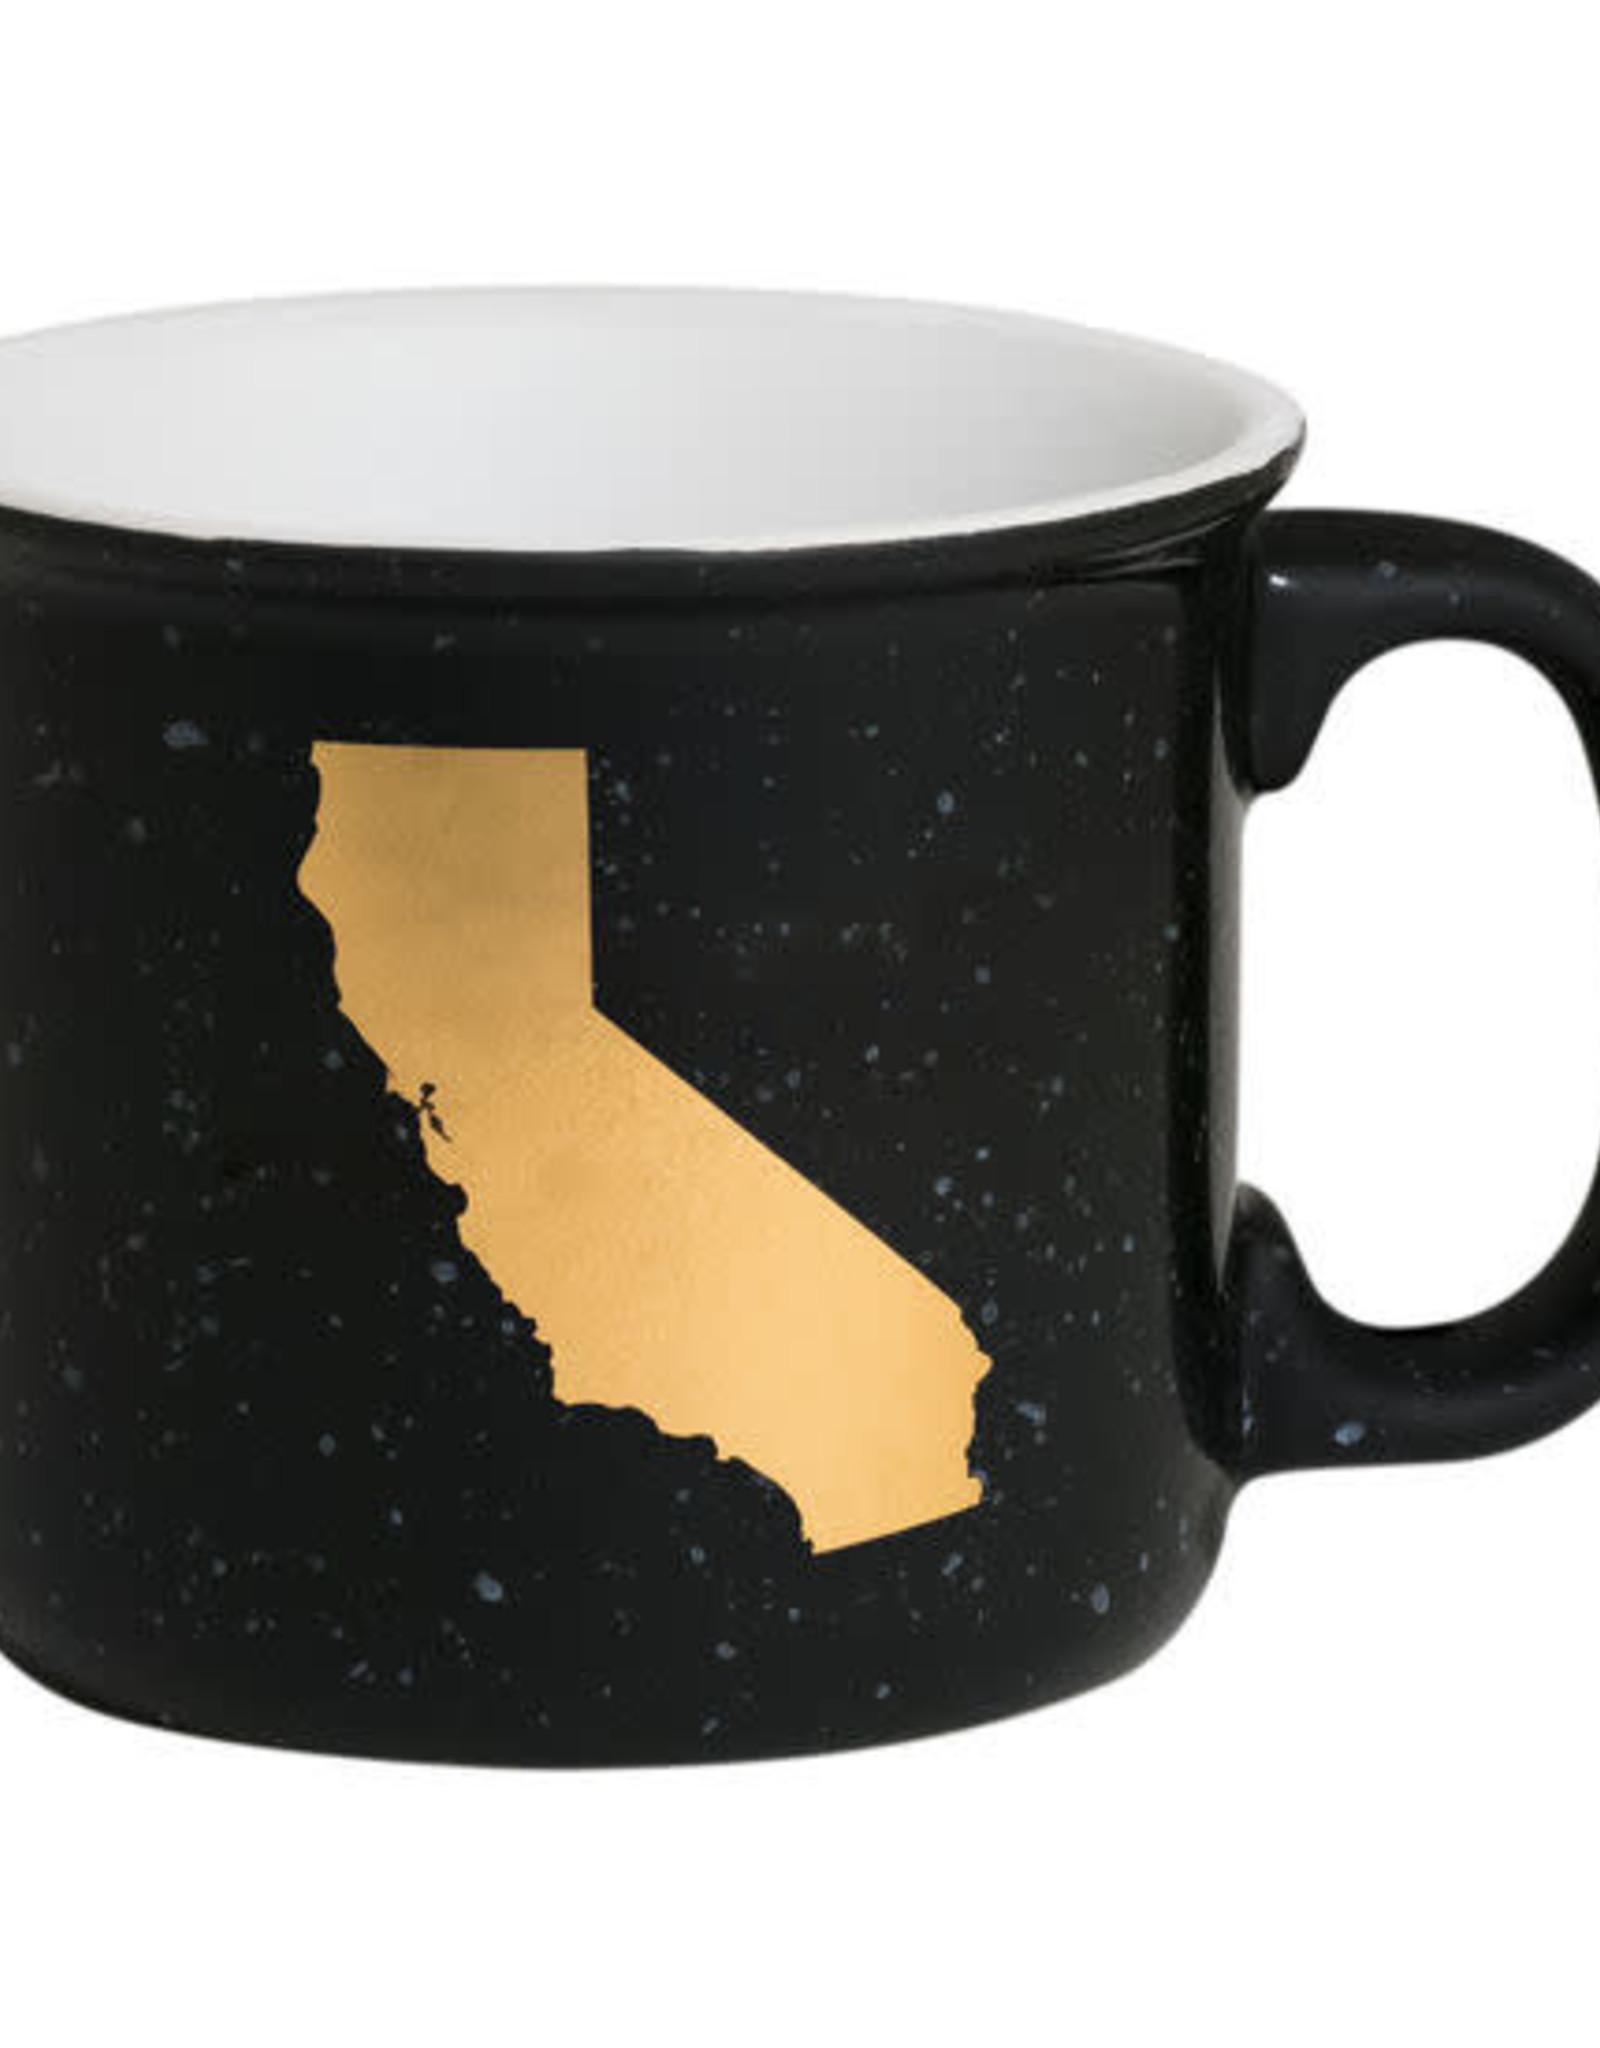 ABOUT FACE ABOUT FACE CALIFORNIA CERAMIC CAMP MUG